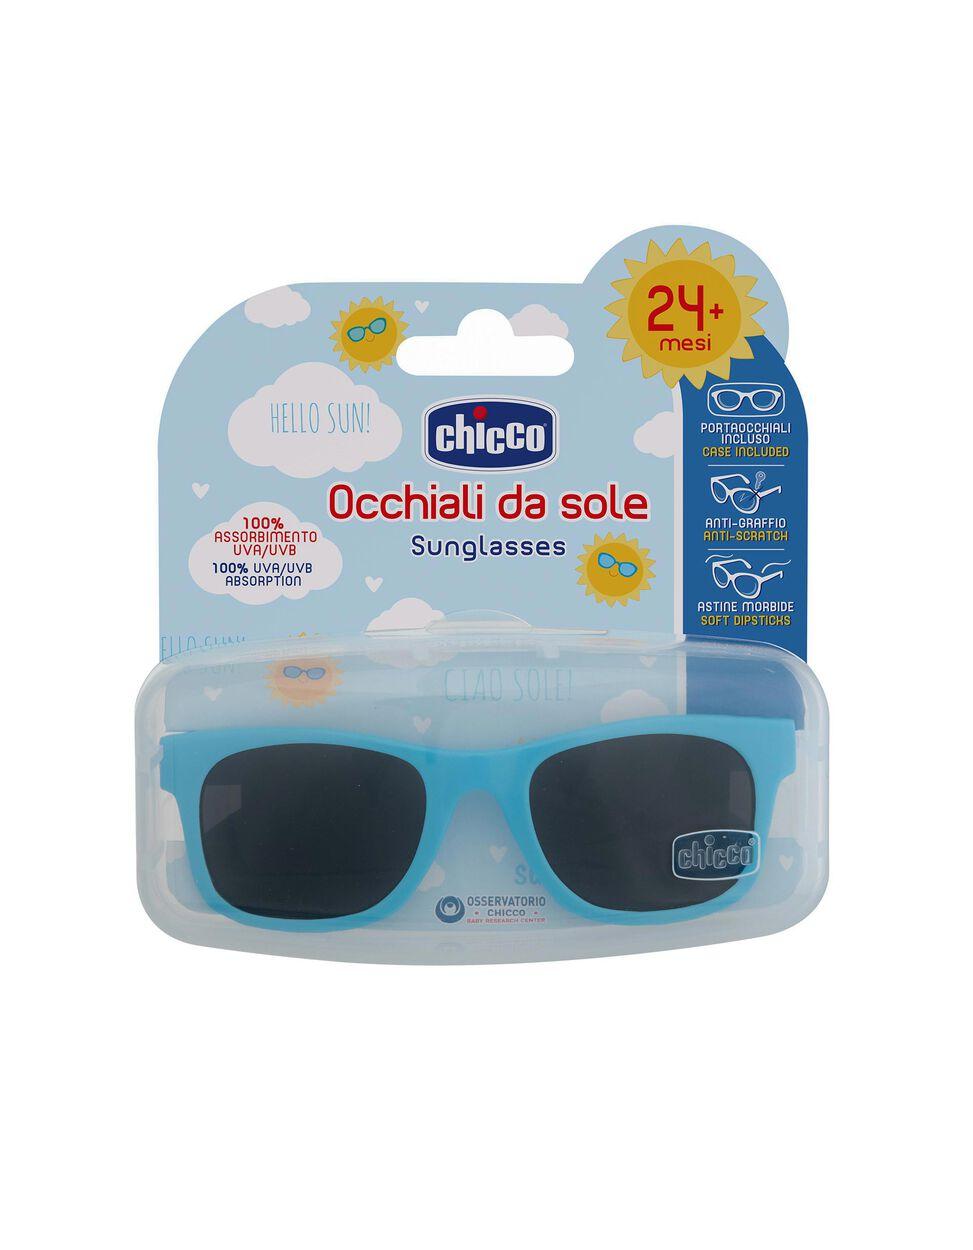 6abcd87c7 Óculos 24M+ Chicco | MO Online